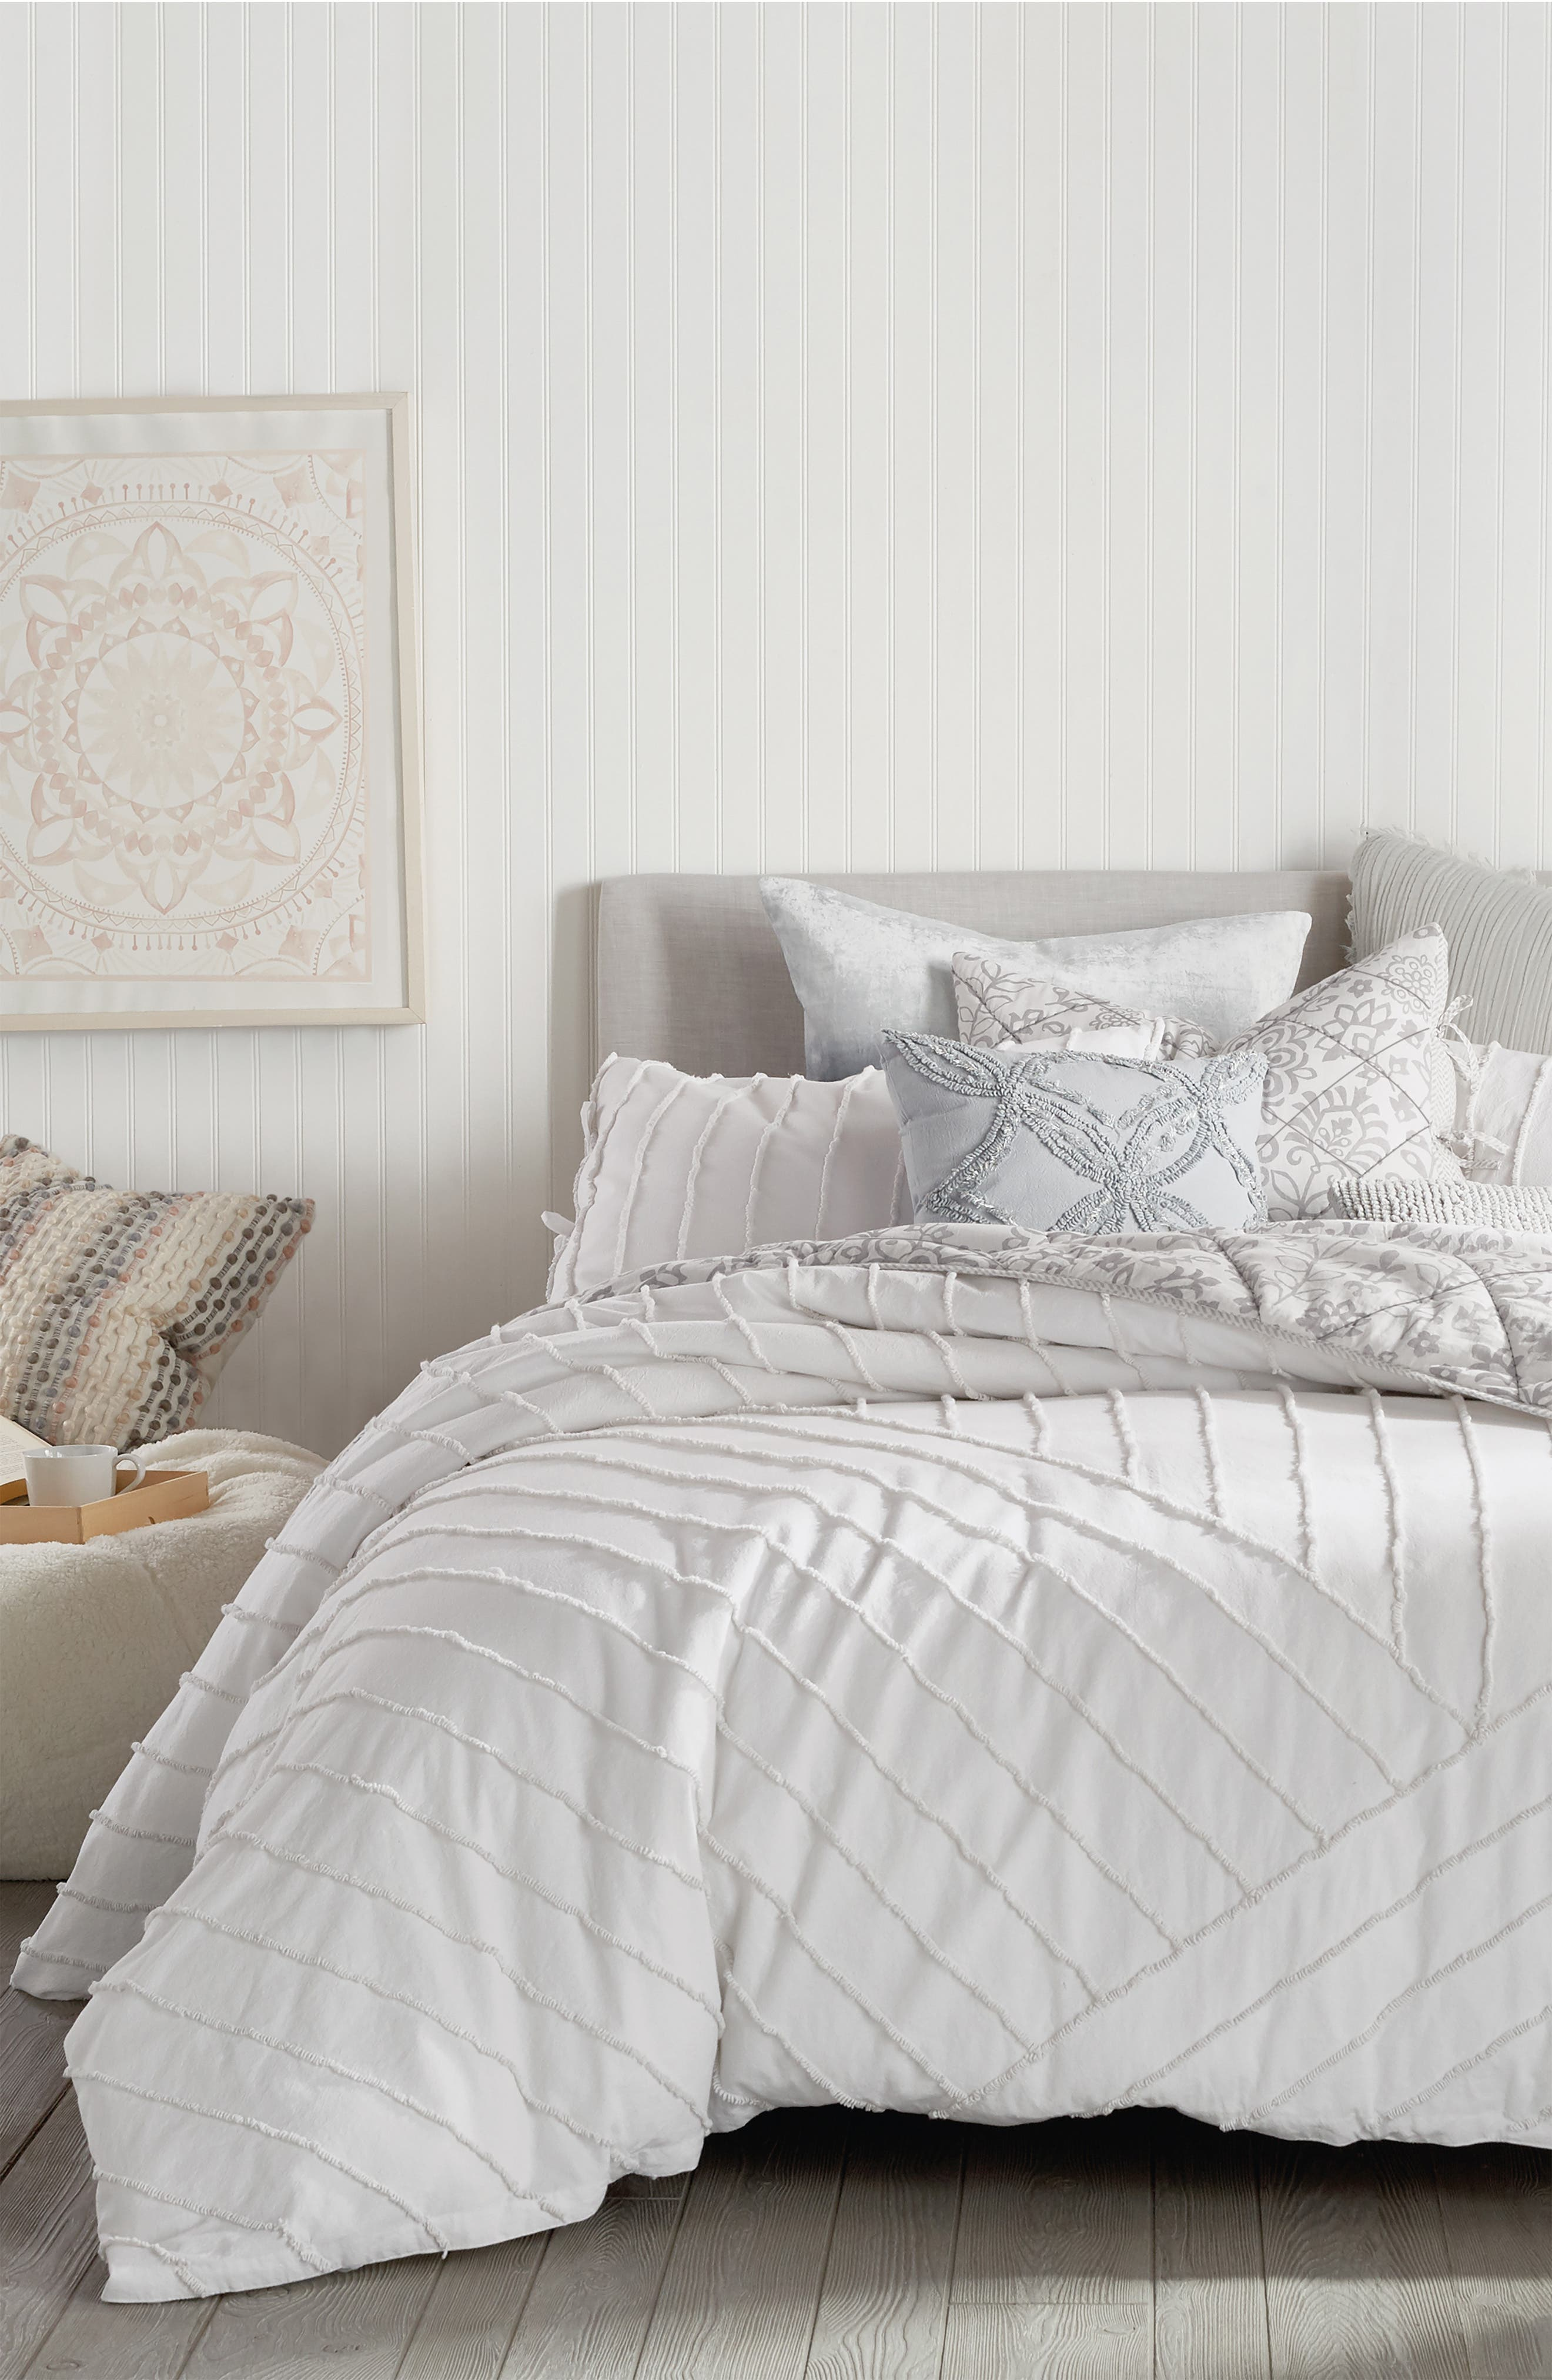 Peri Home Linear Loop Comforter  Sham Set Size King  White